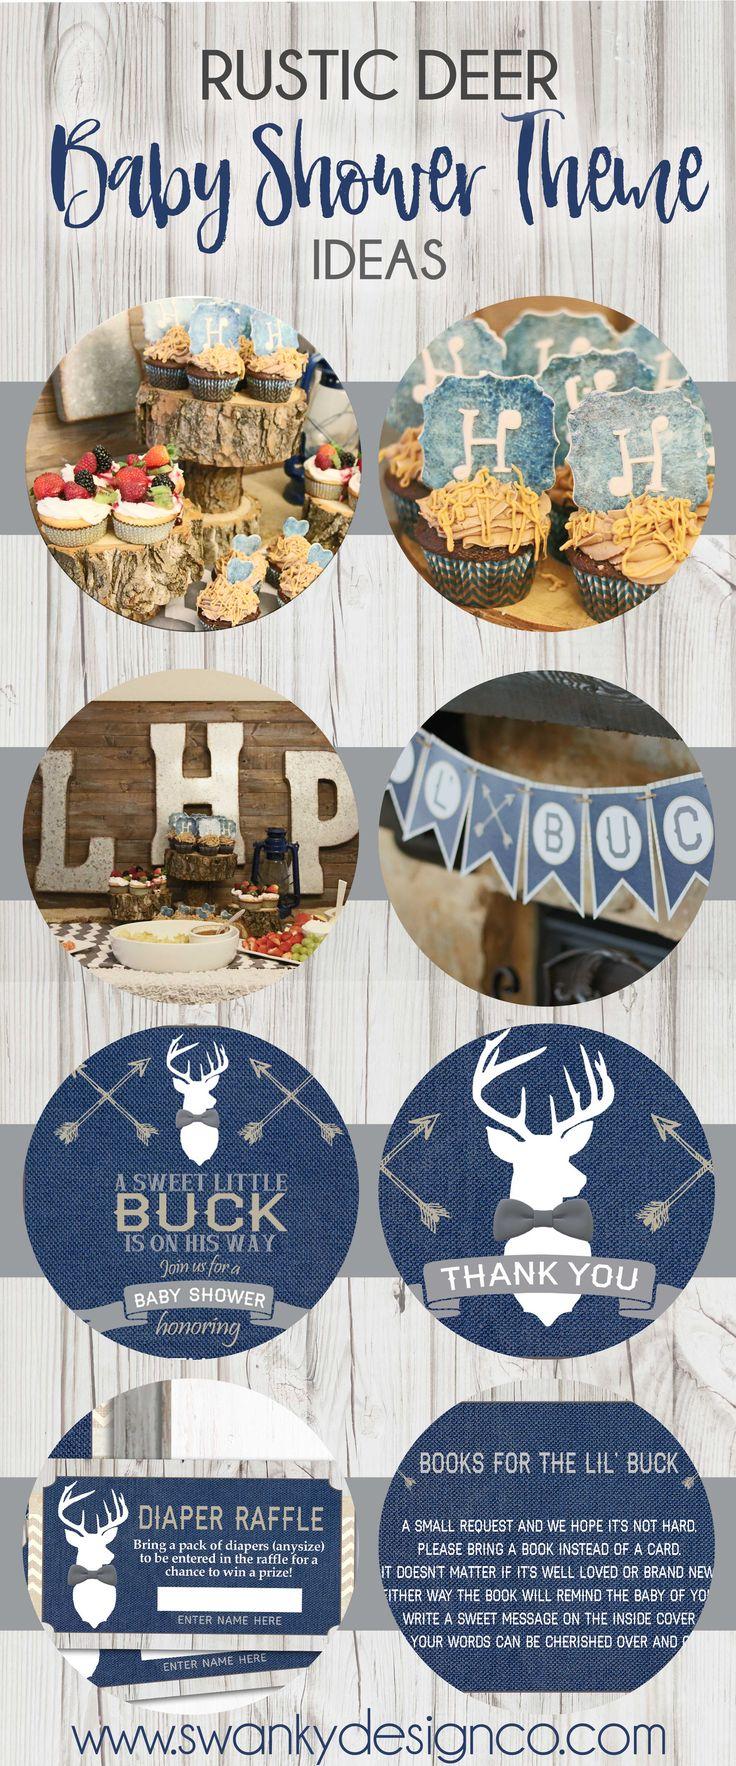 Rustic Deer Baby Shower Theme Ideas, Little Buck Baby Shower Theme, Navy and Gray Deer Baby Shower, Bowtie Deer Baby Shower, Deer Baby Shower Invitations